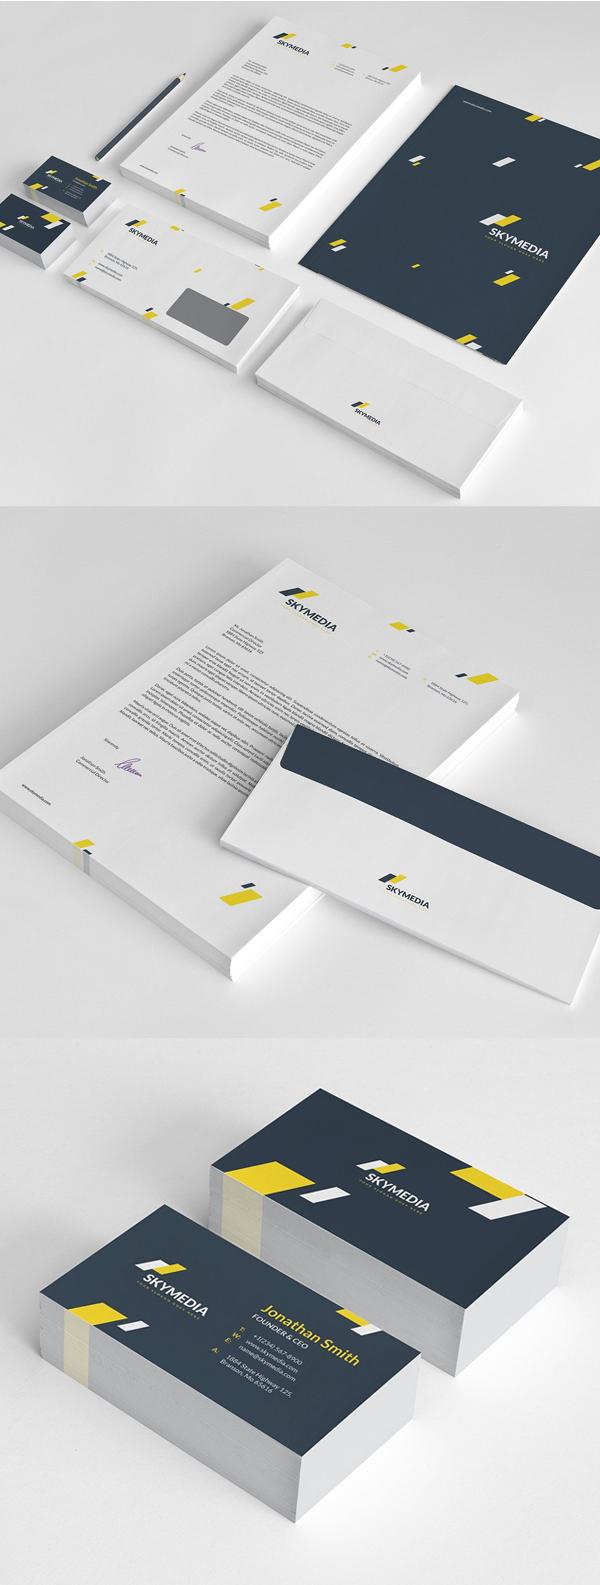 50 Professional Corporate Branding / Stationery Templates Design - 2